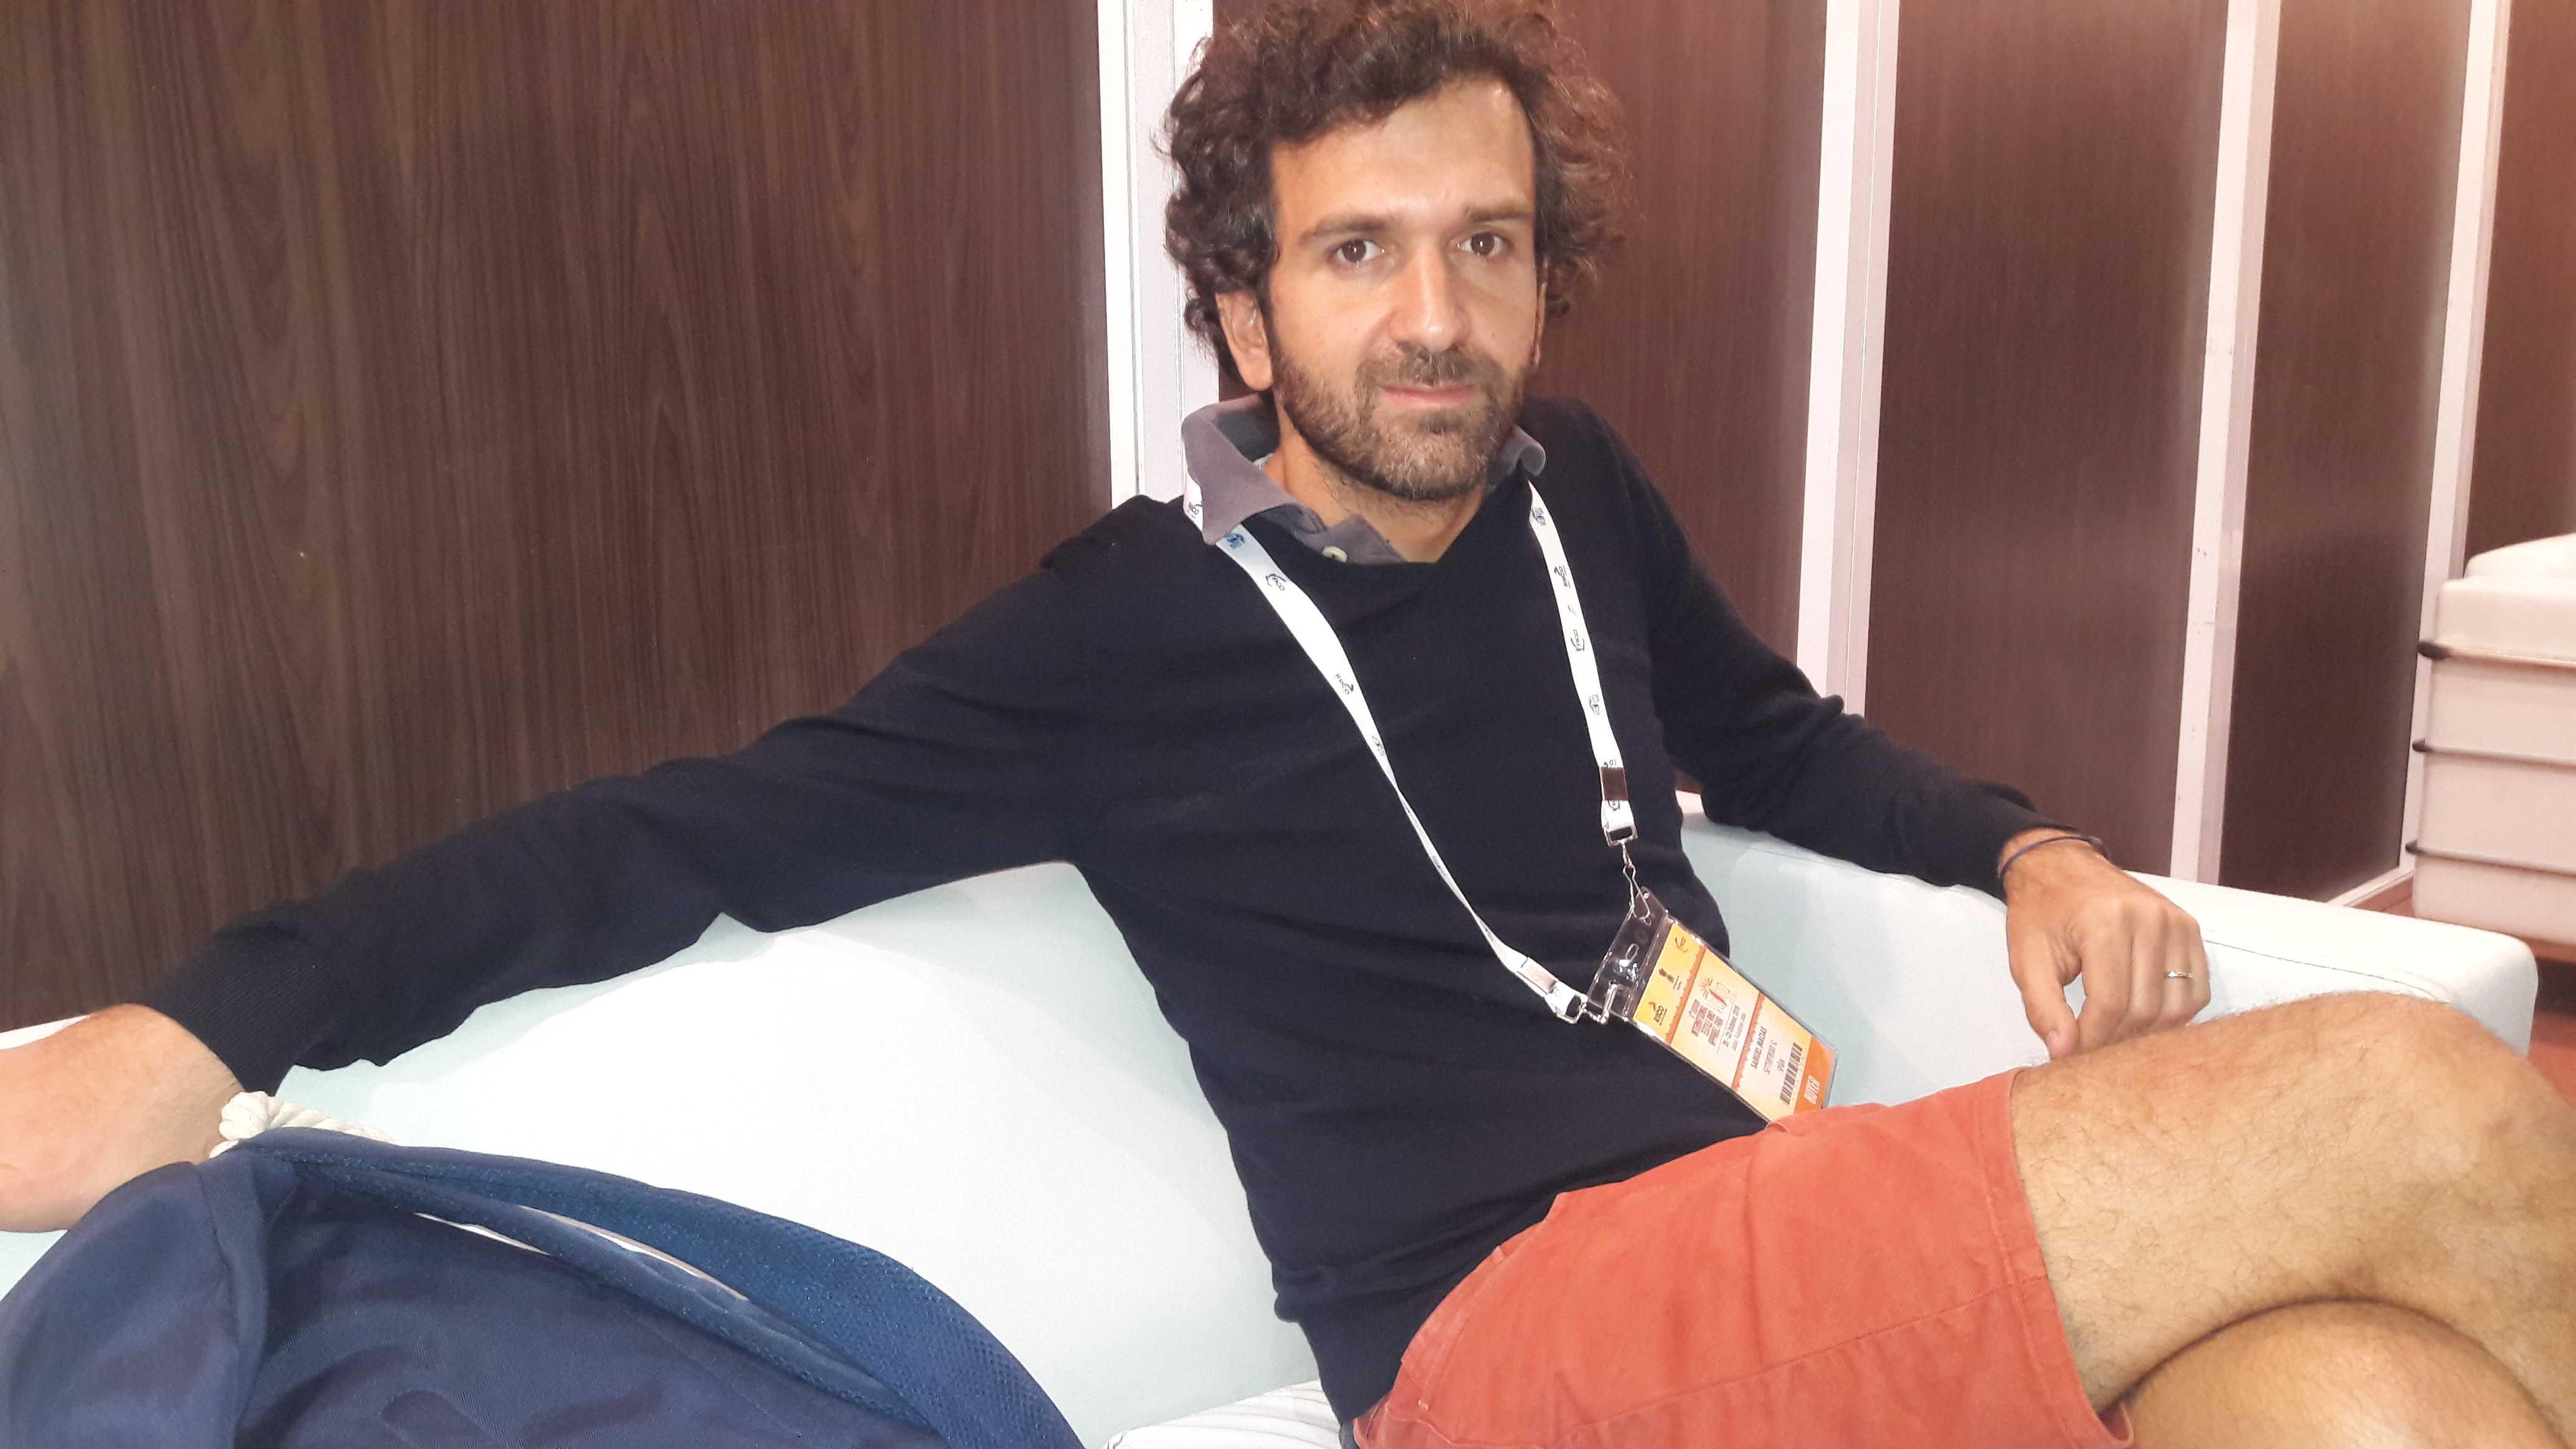 Samuel Macias from Spainfnbworld